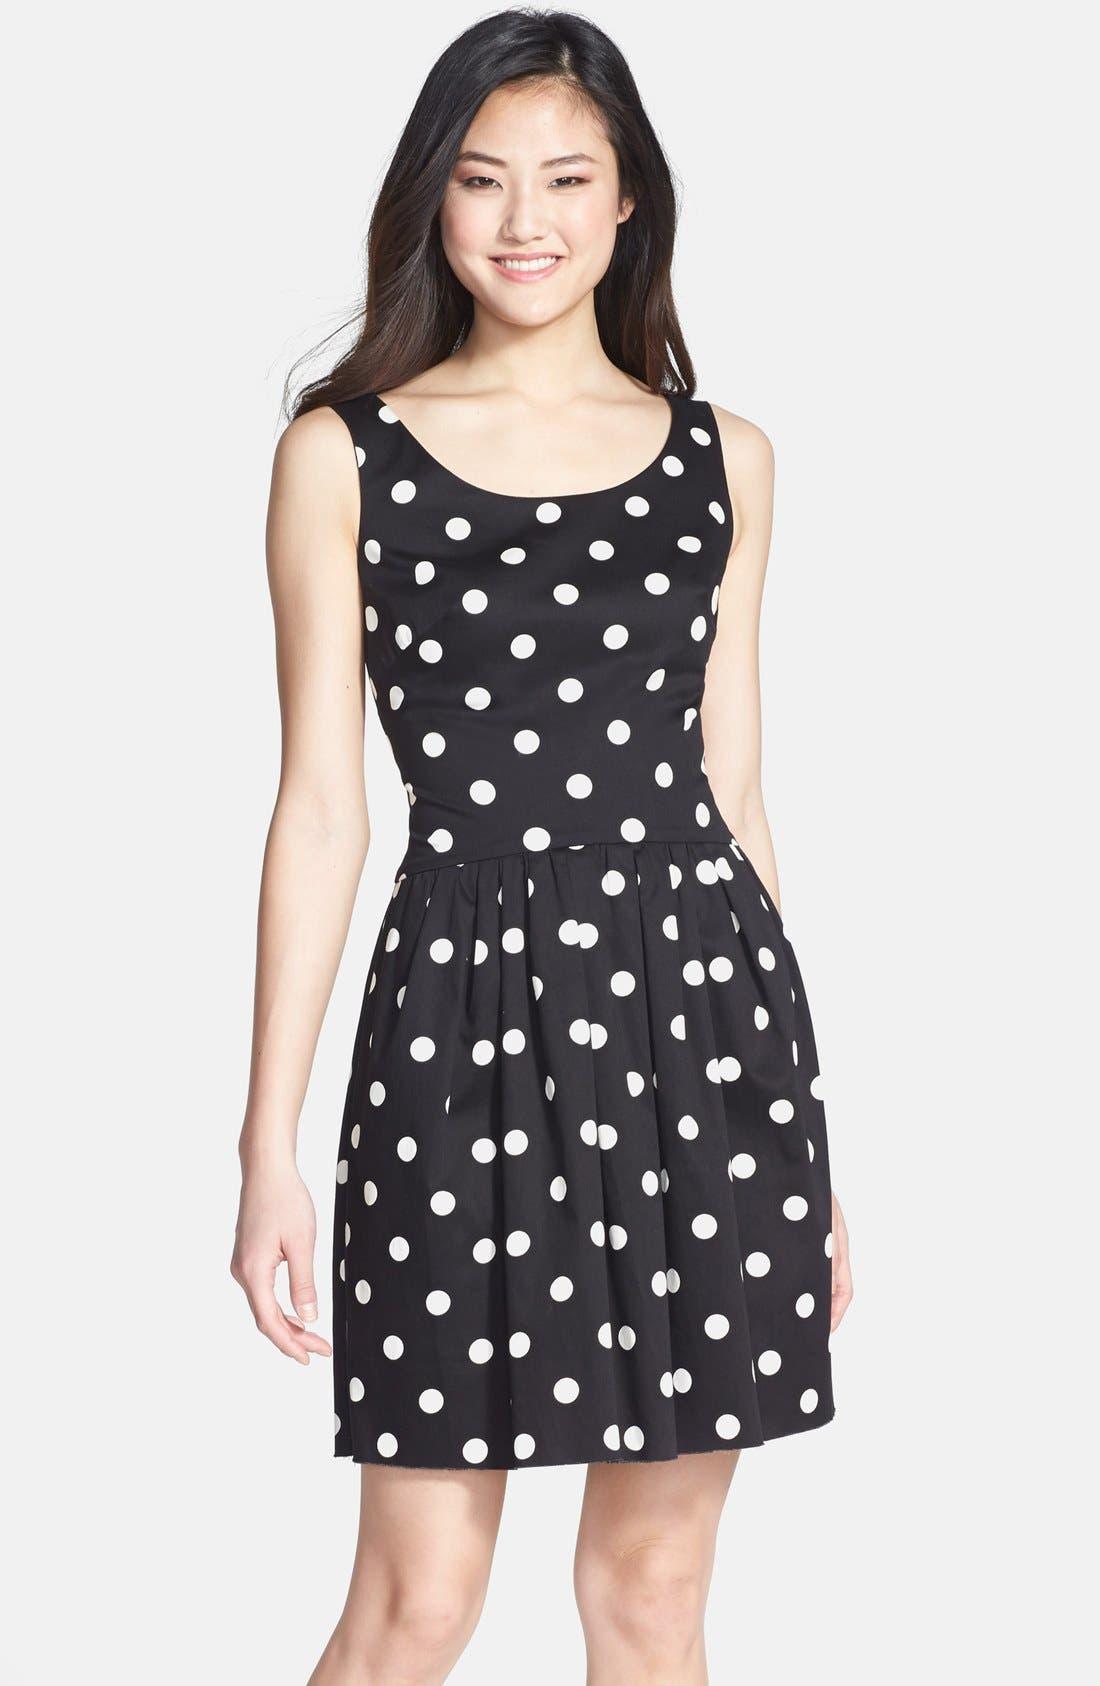 Main Image - Betsey Johnson Polka Dot Bow Detail Fit & Flare Dress